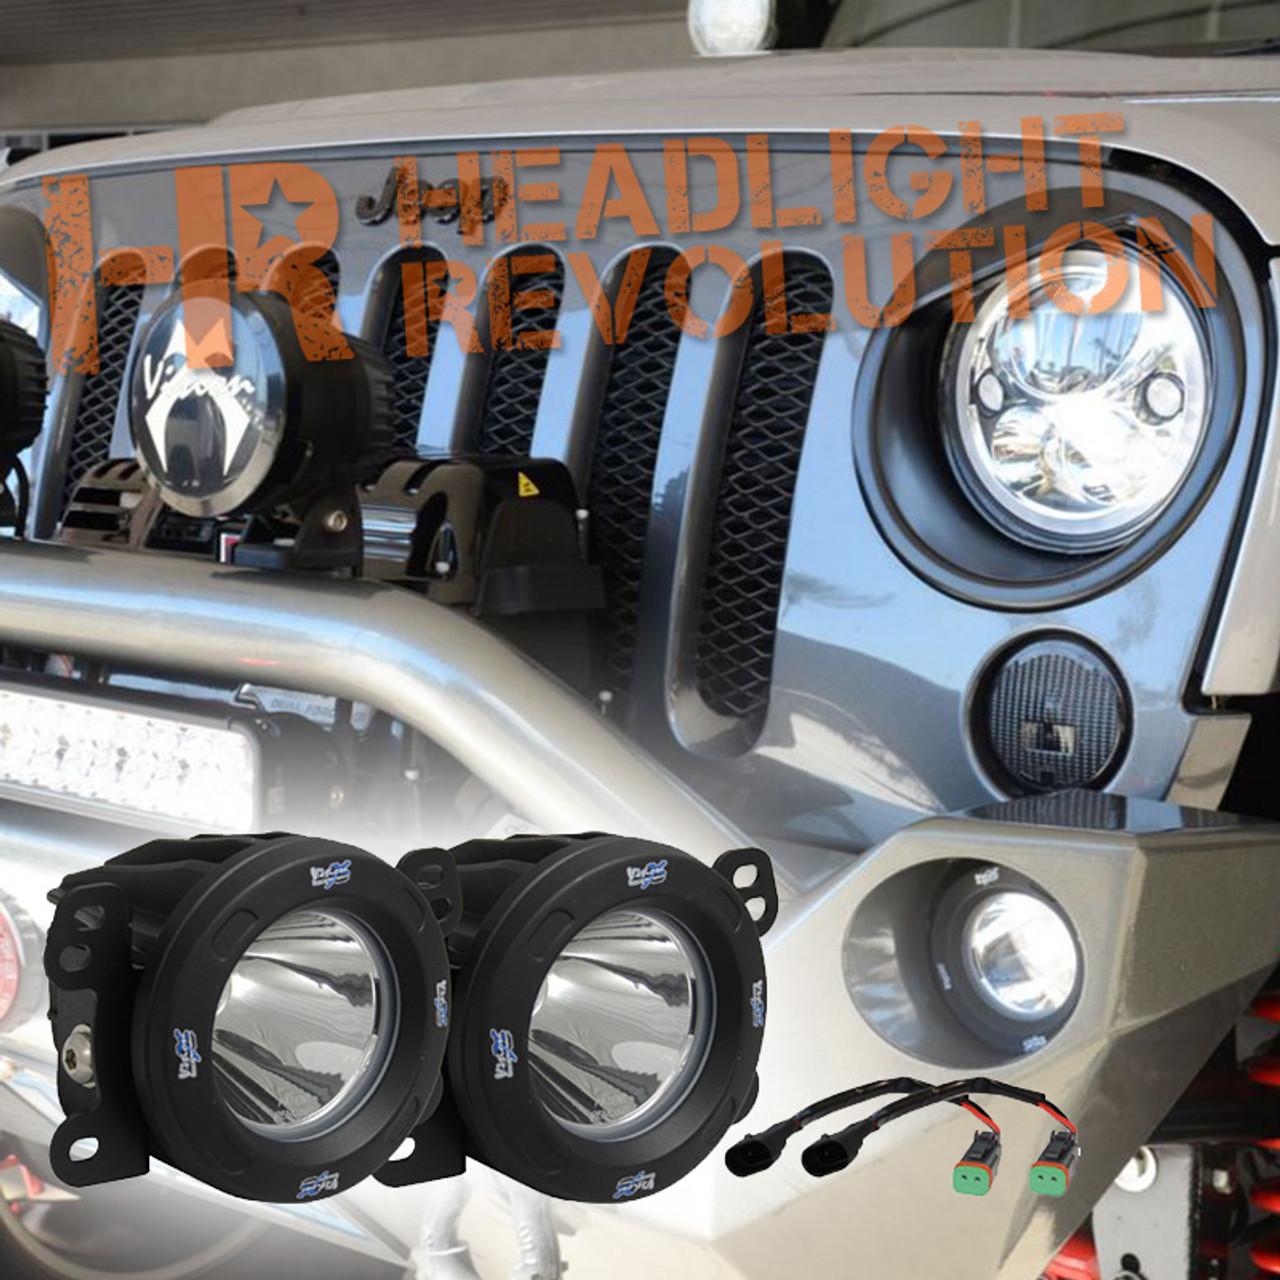 Vision X 07 09 Jeep Jk Fog Light Upgrade Kit With Optimus 20 Degree Led Lights